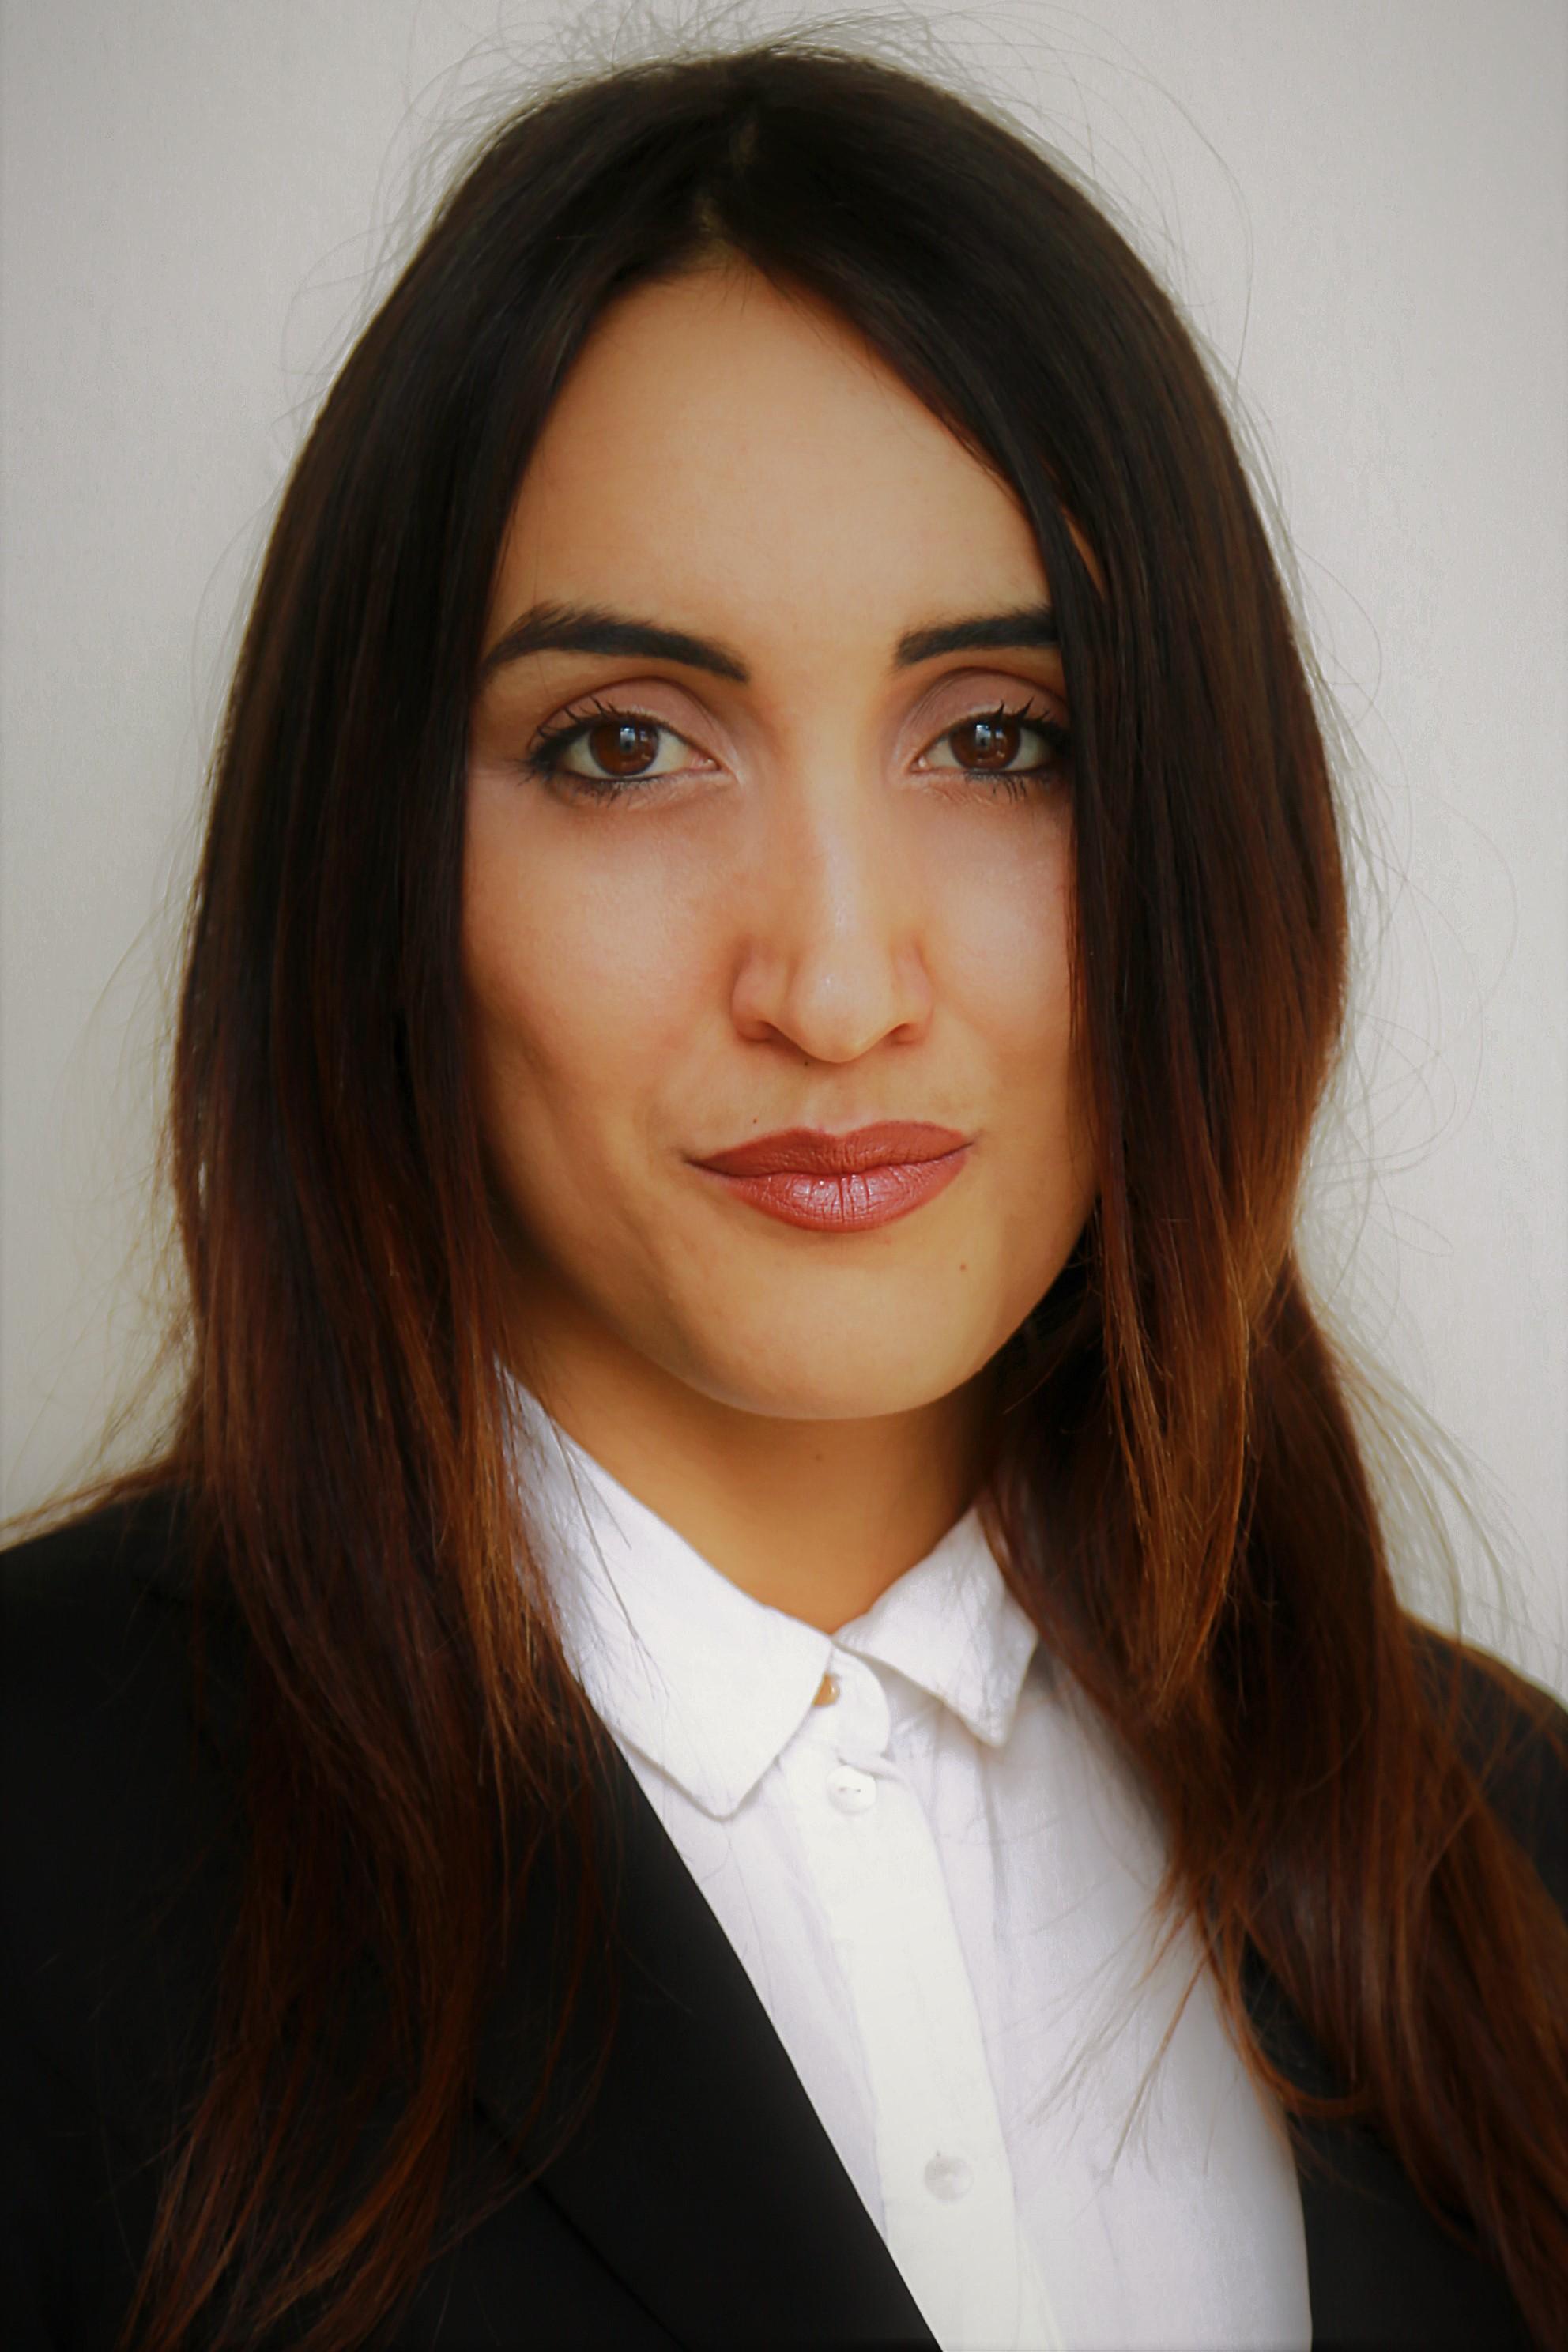 Celine Sacha Carrocci